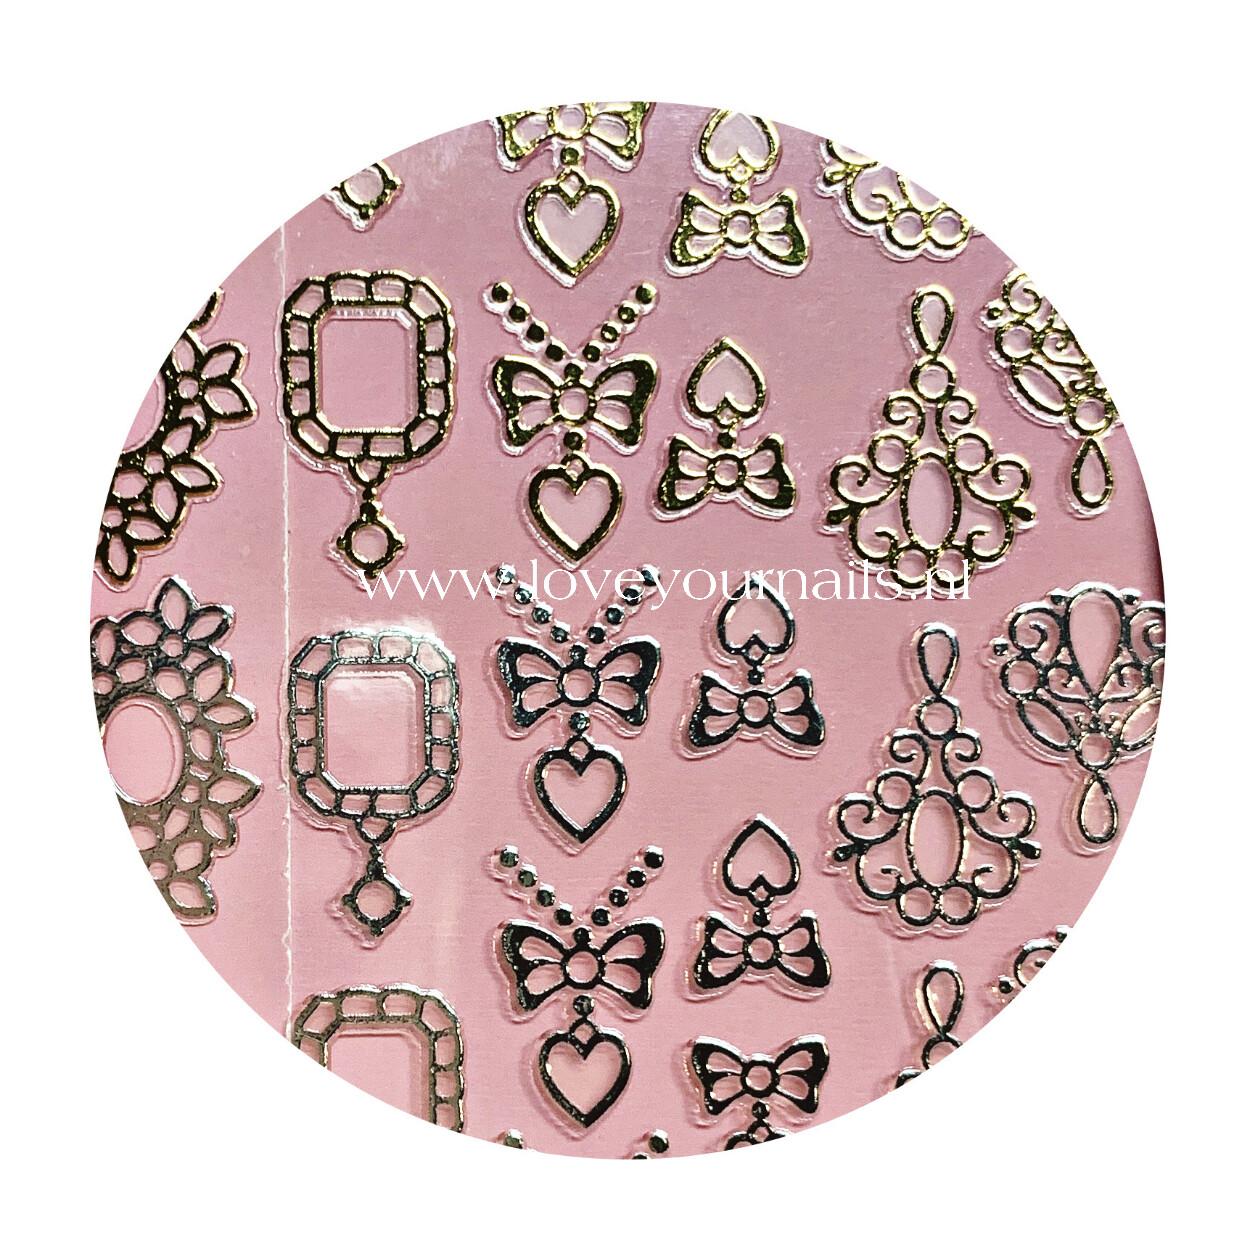 Charmicon Silicone Stickers Jewelry Gold/Silver #4